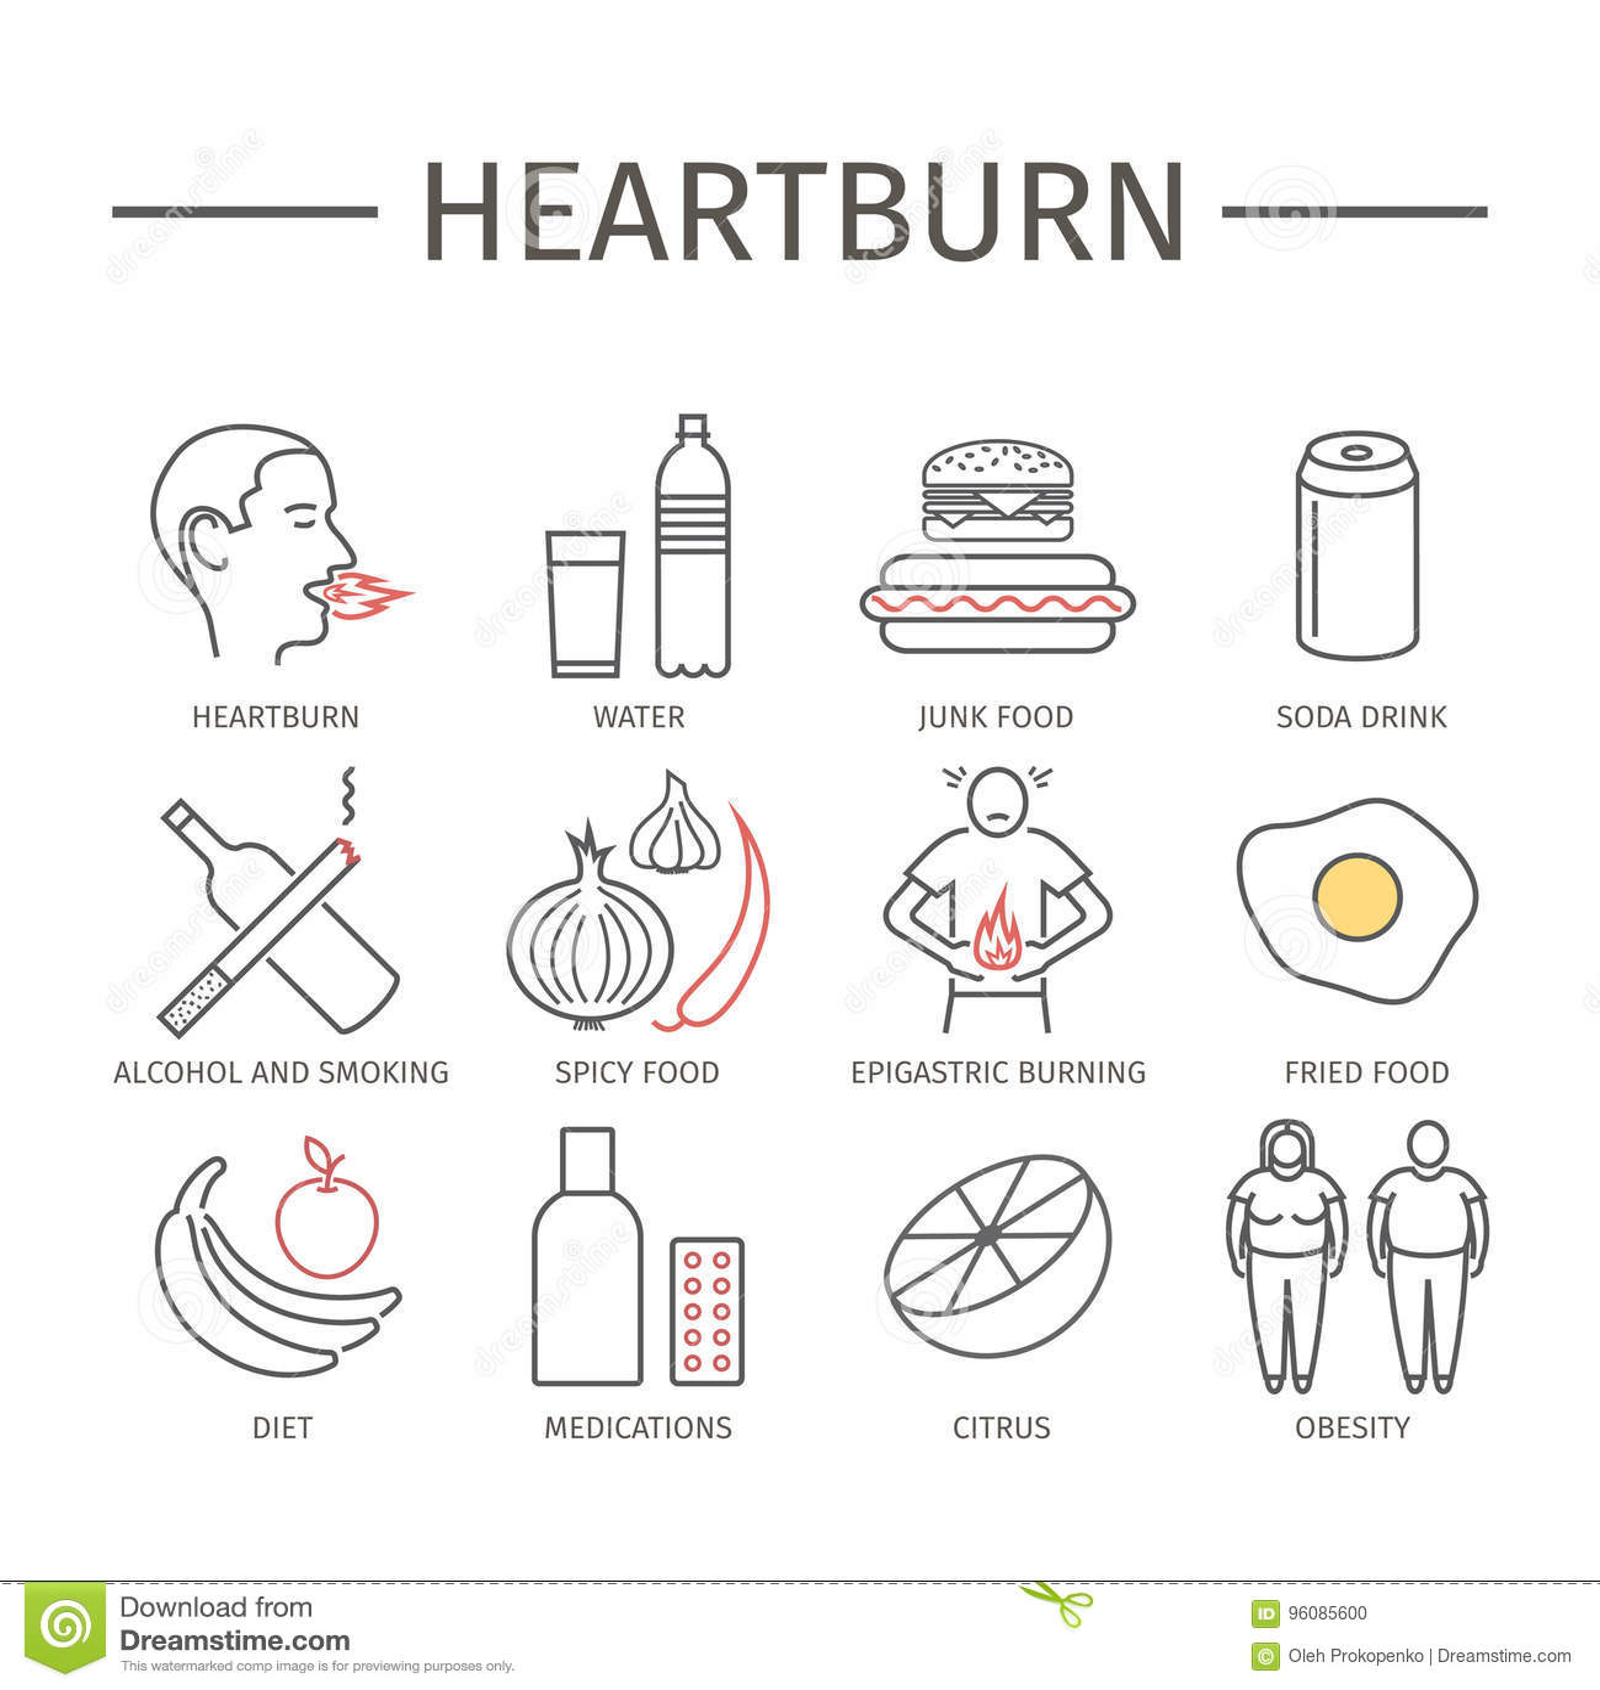 Heartburn Symptoms Treatment Line Icons Set Vector